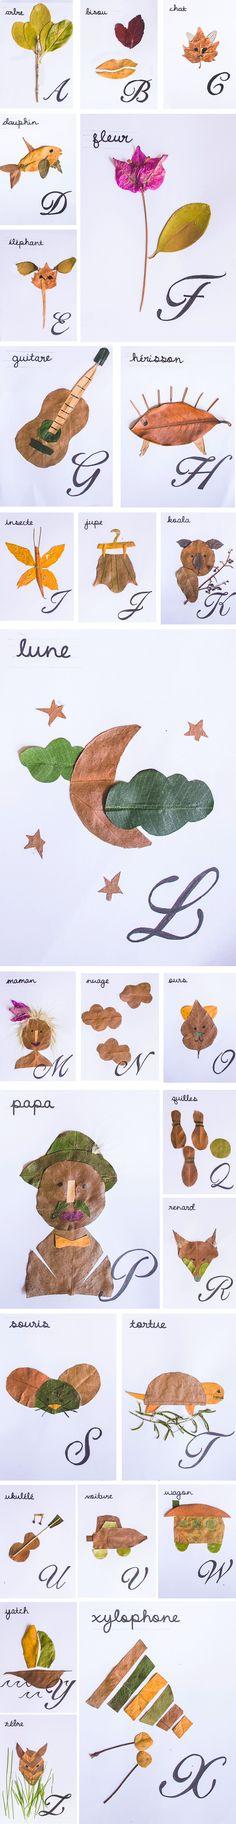 DIY herbier alphabet par Natacha Birds http://www.natacha-birds.fr/leblog/diy-alphabet-feuilles/